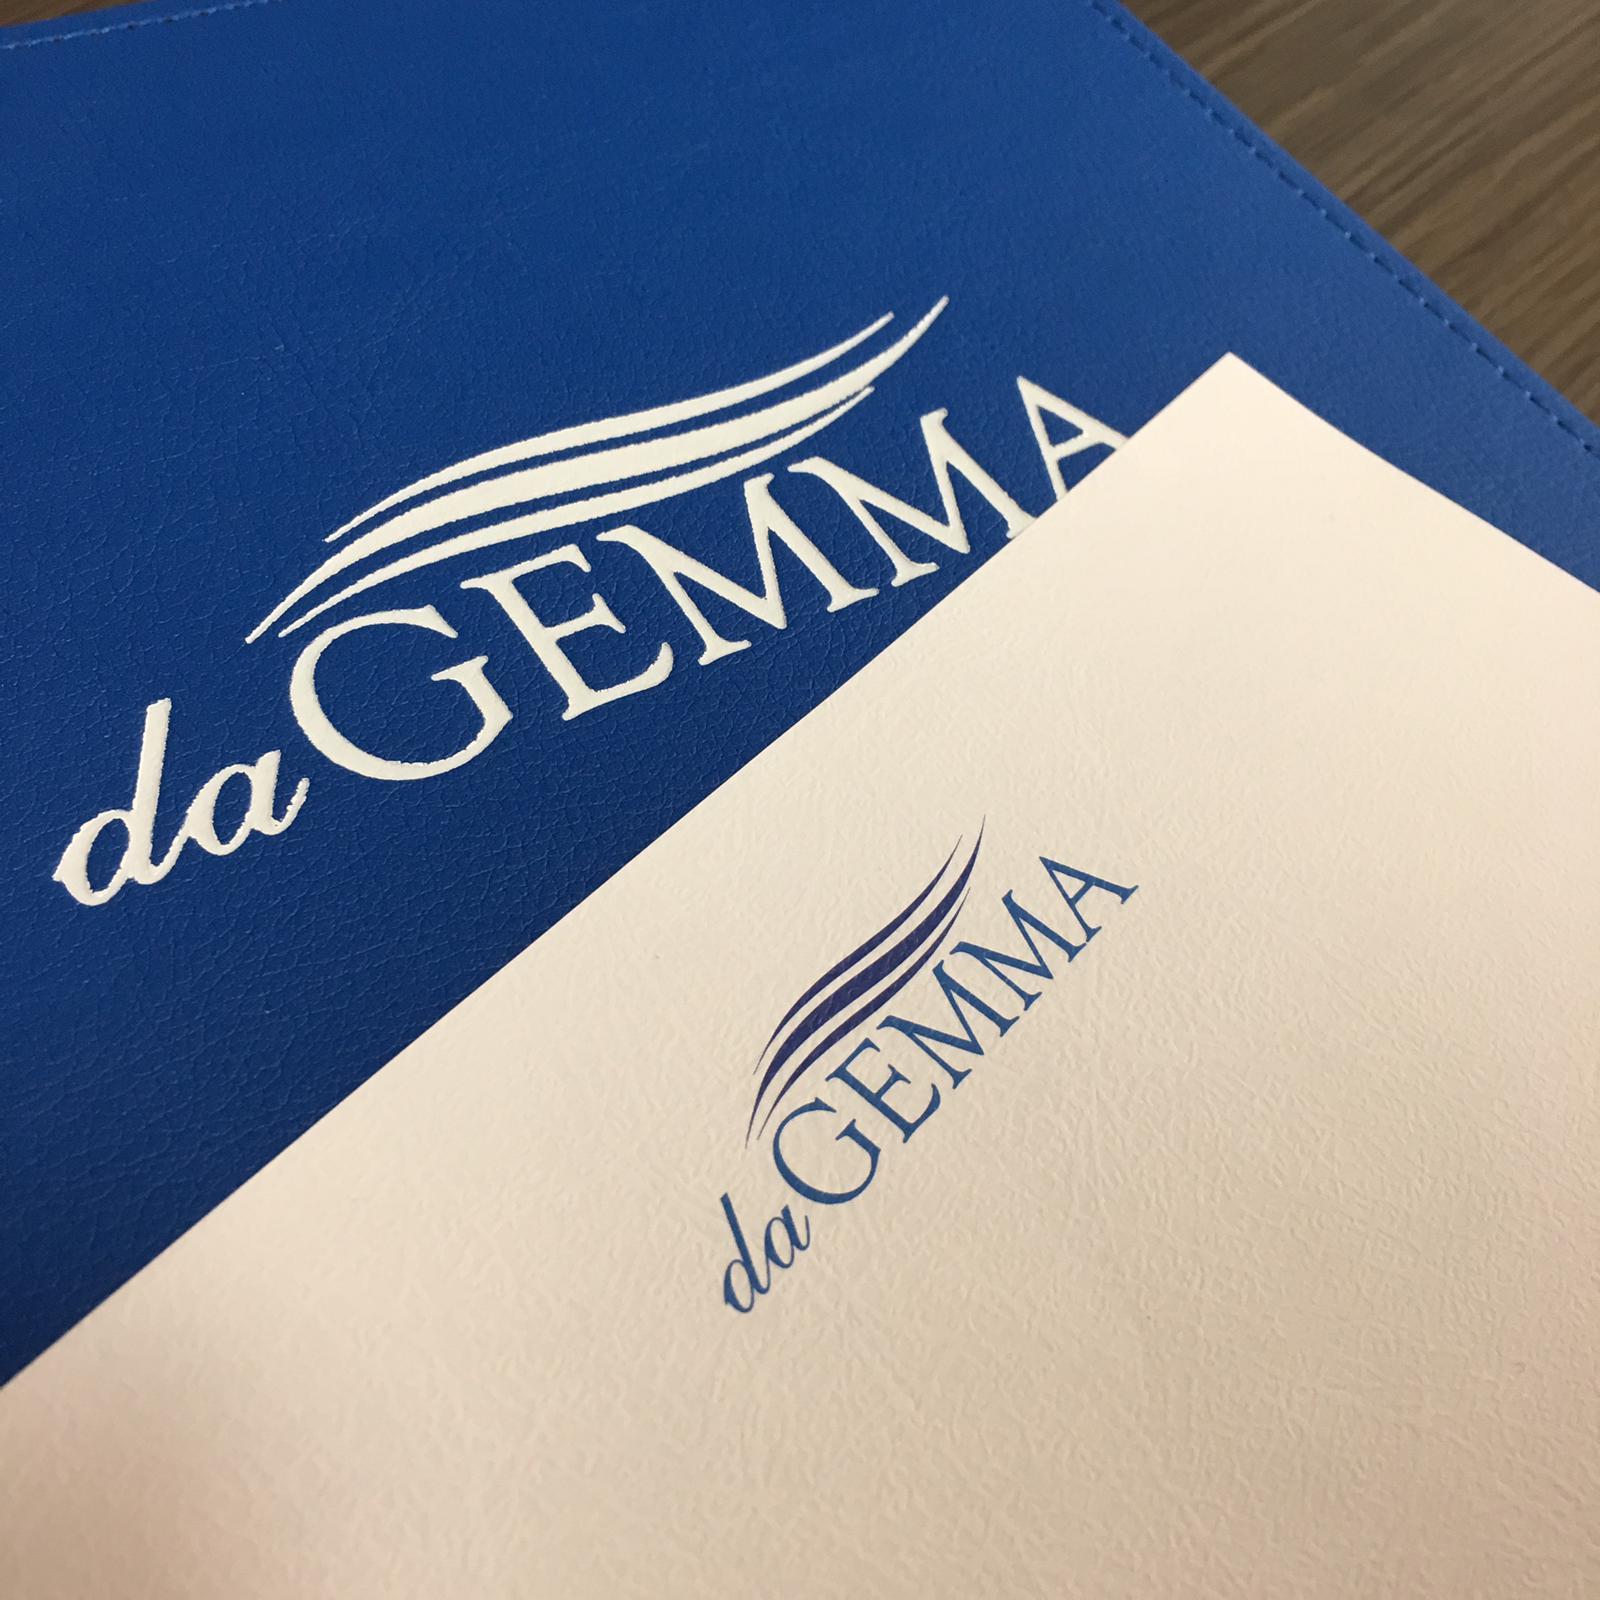 dagemma-immagine coordinata2